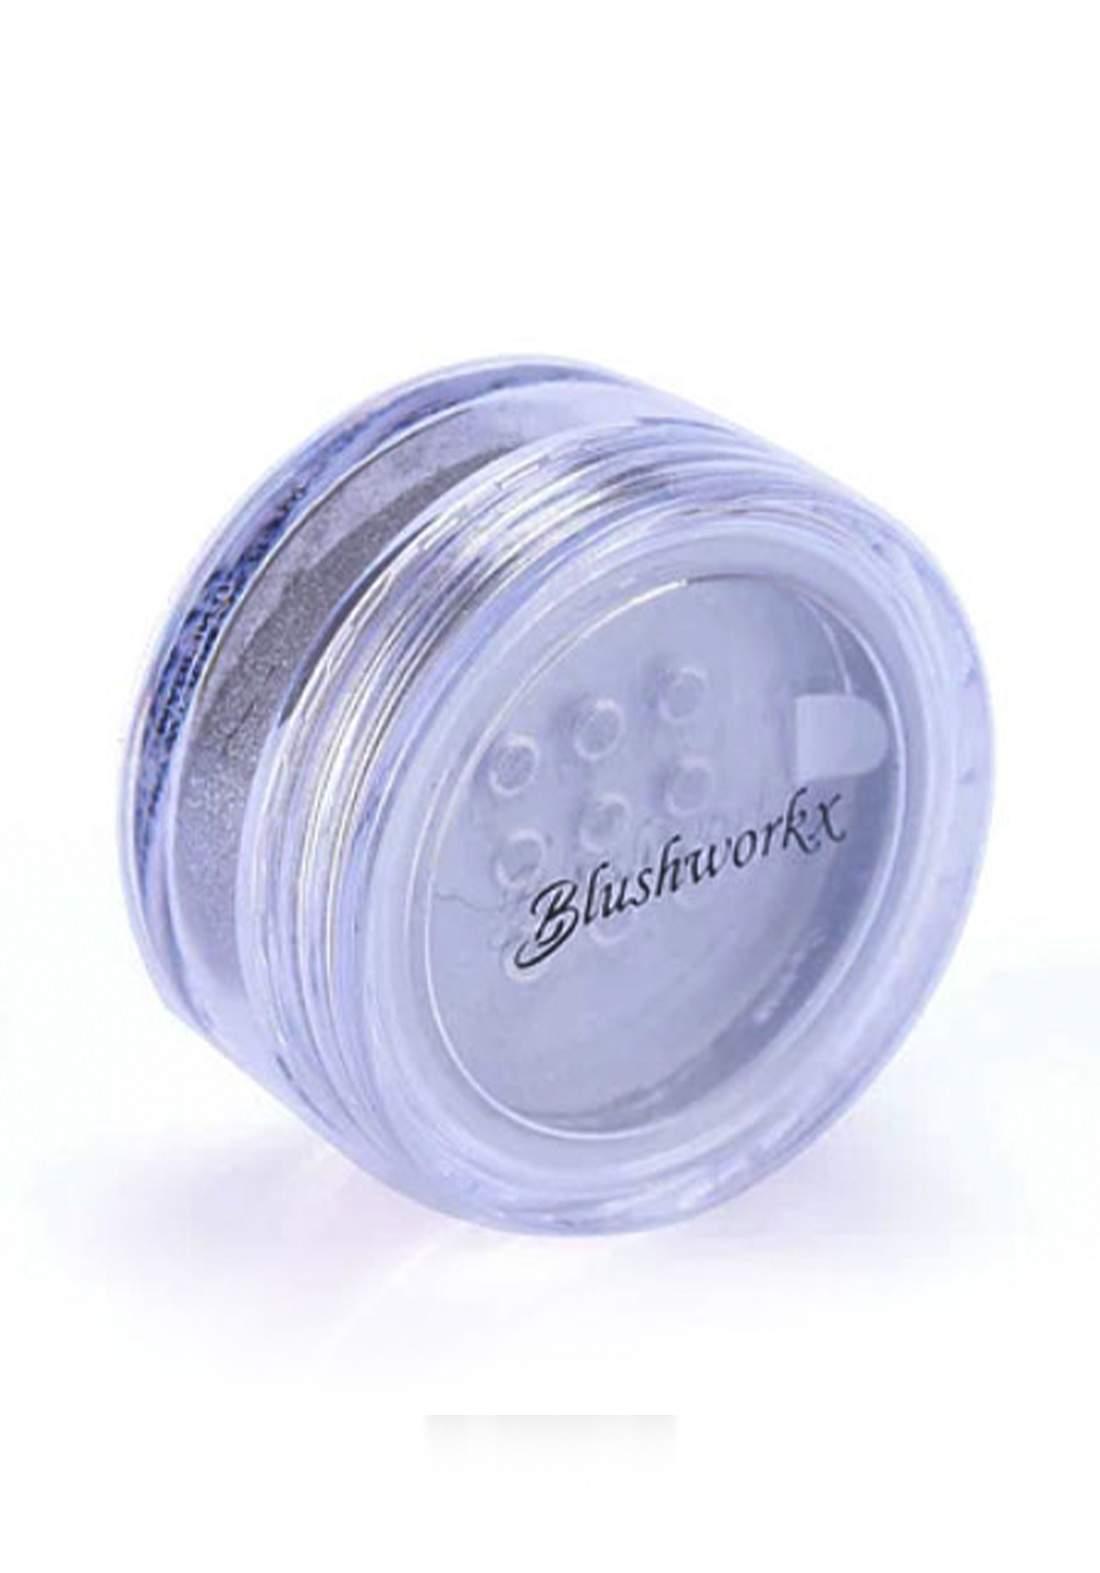 Blushworkx Hollywood Mineral Eye Dust No.8 Silver Grey 1.5g ظلال للعيون